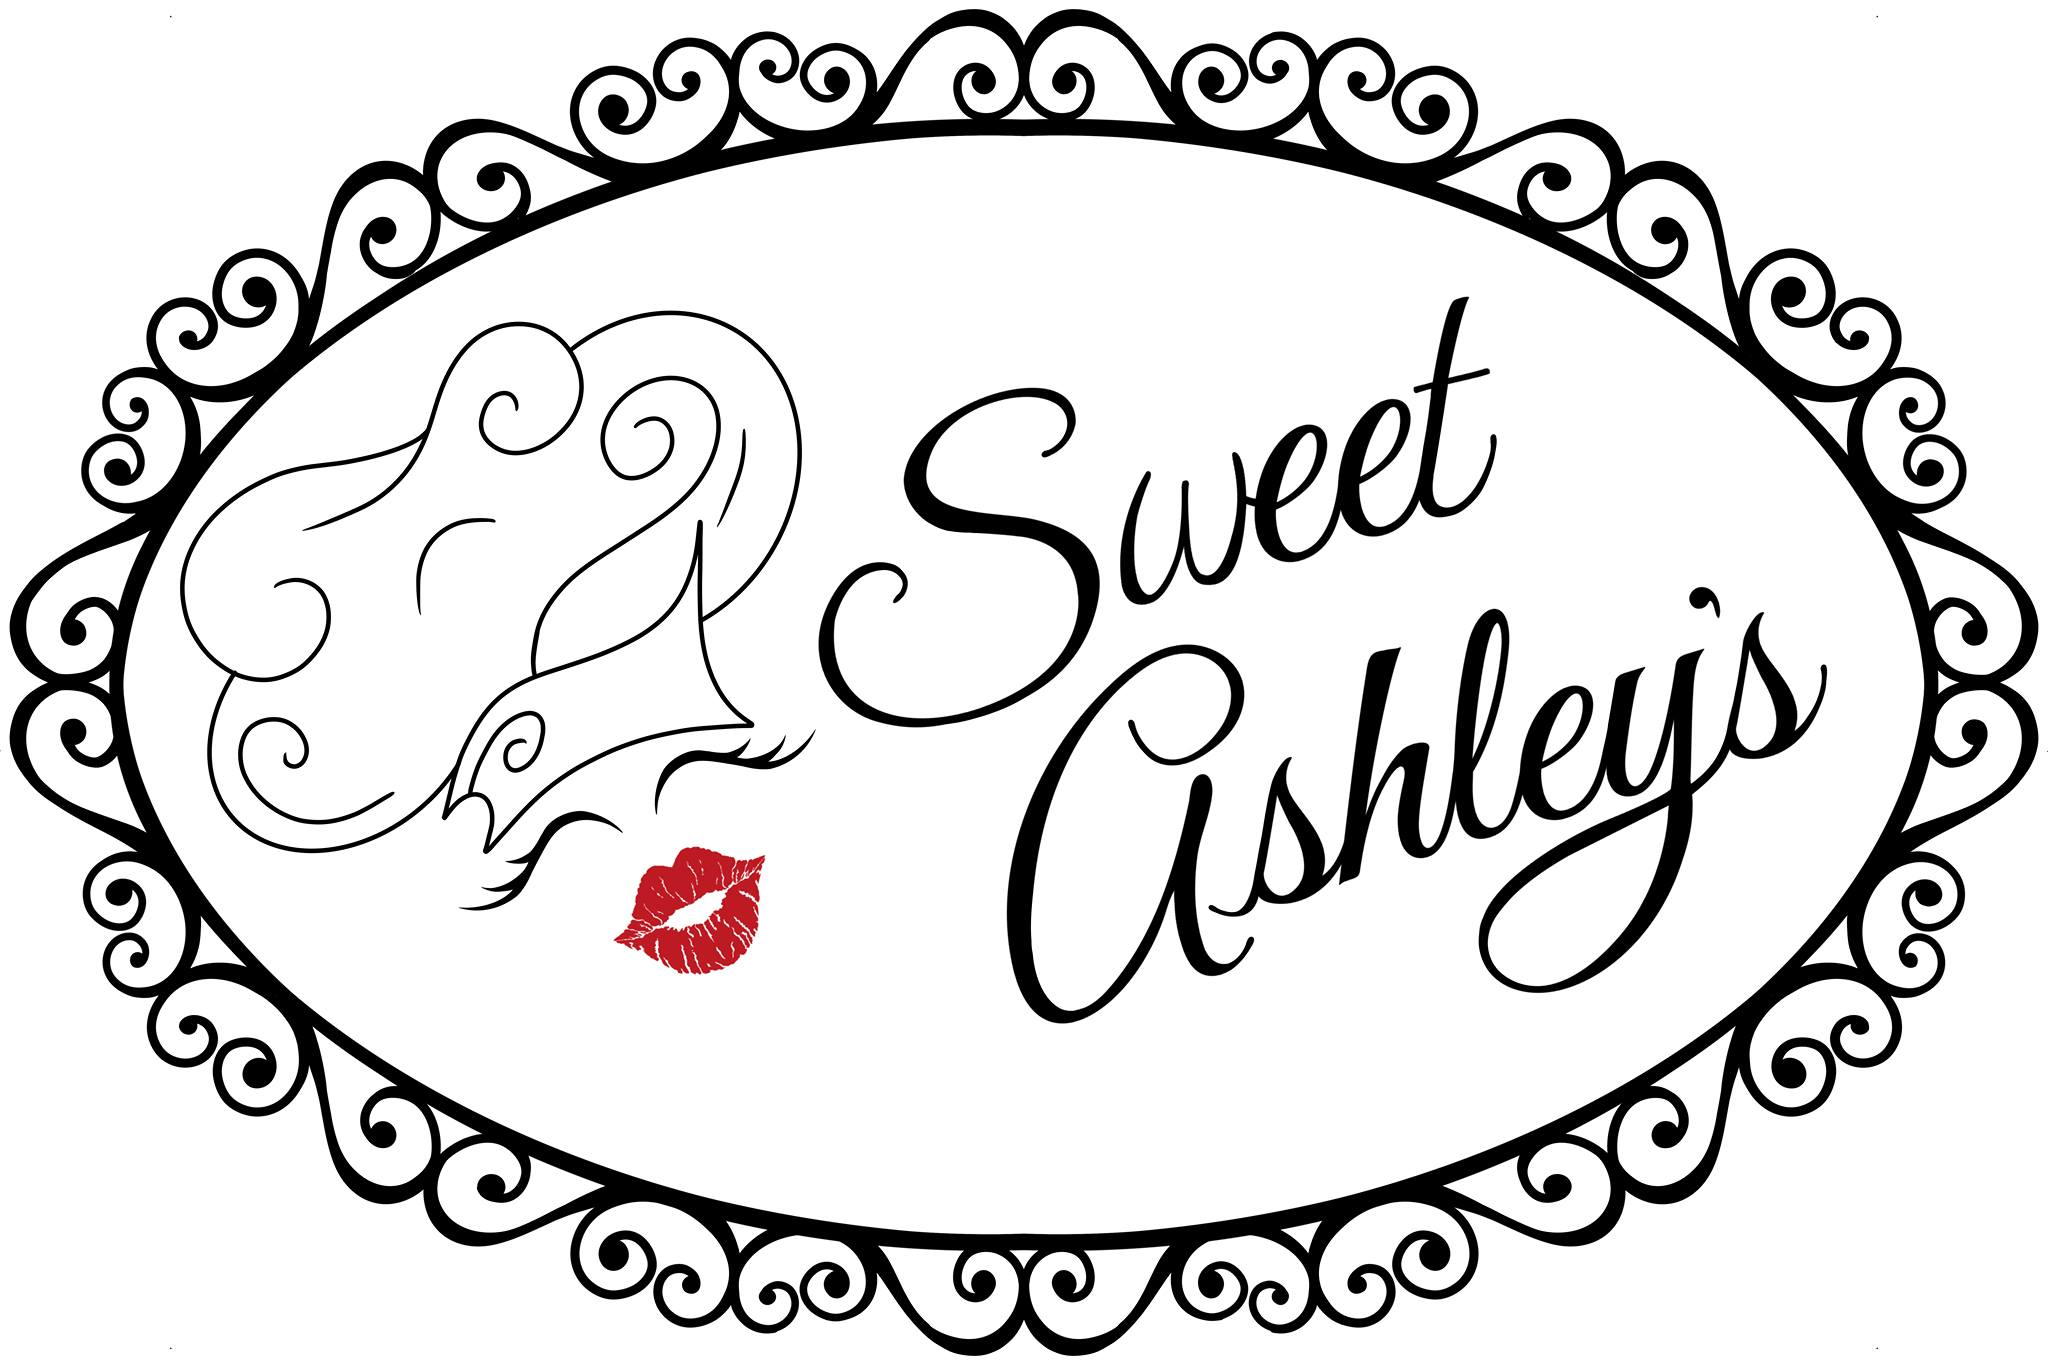 Sweet Ashley's